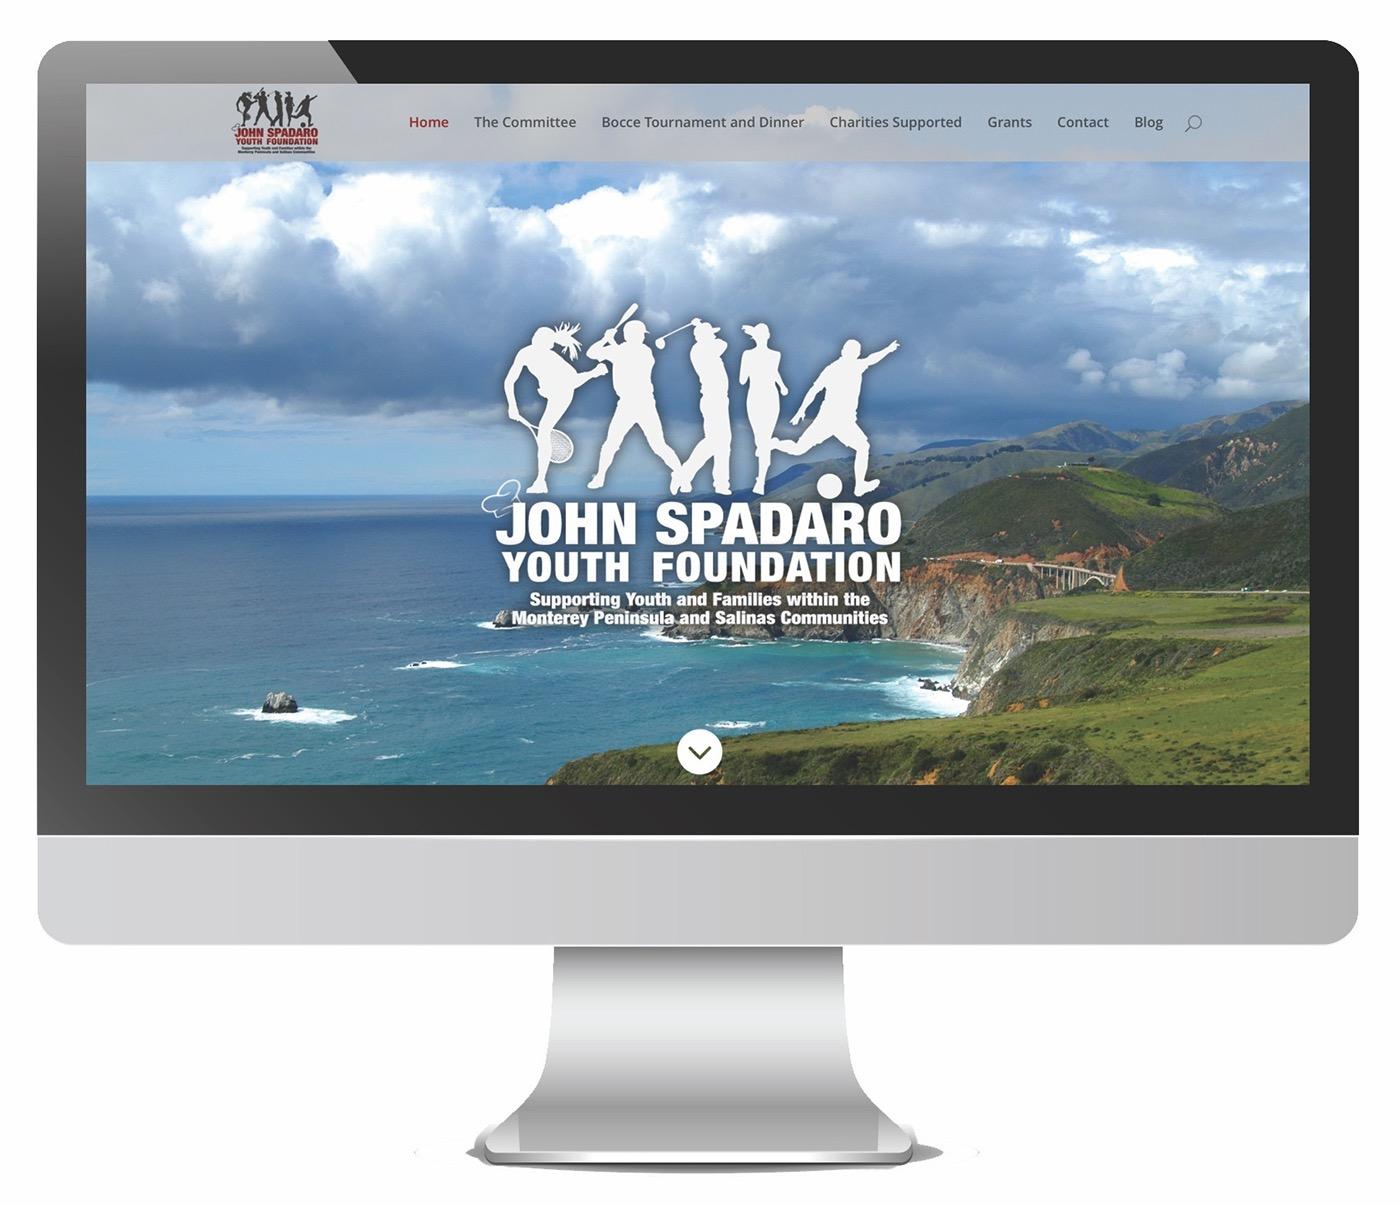 john spadaro,charity,Website